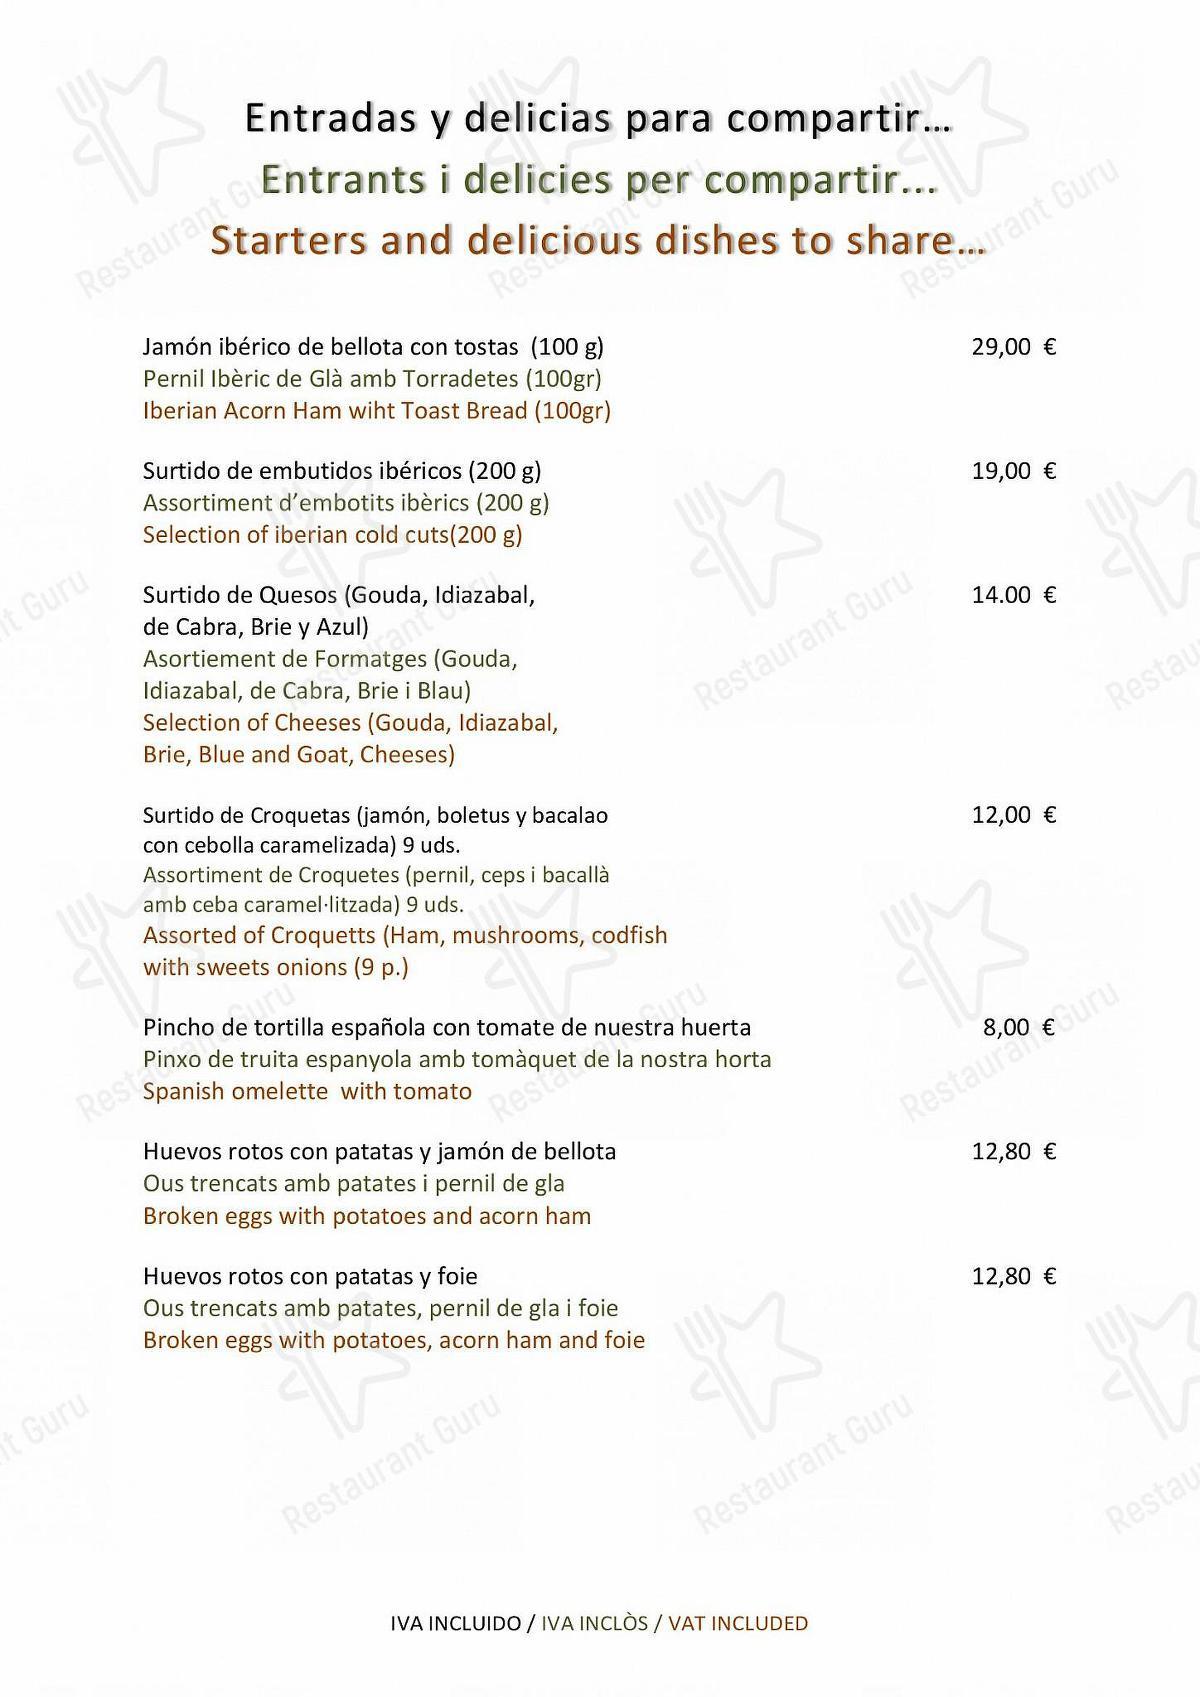 Mira la carta de Balmes 103 - Hotel Barcelona Center